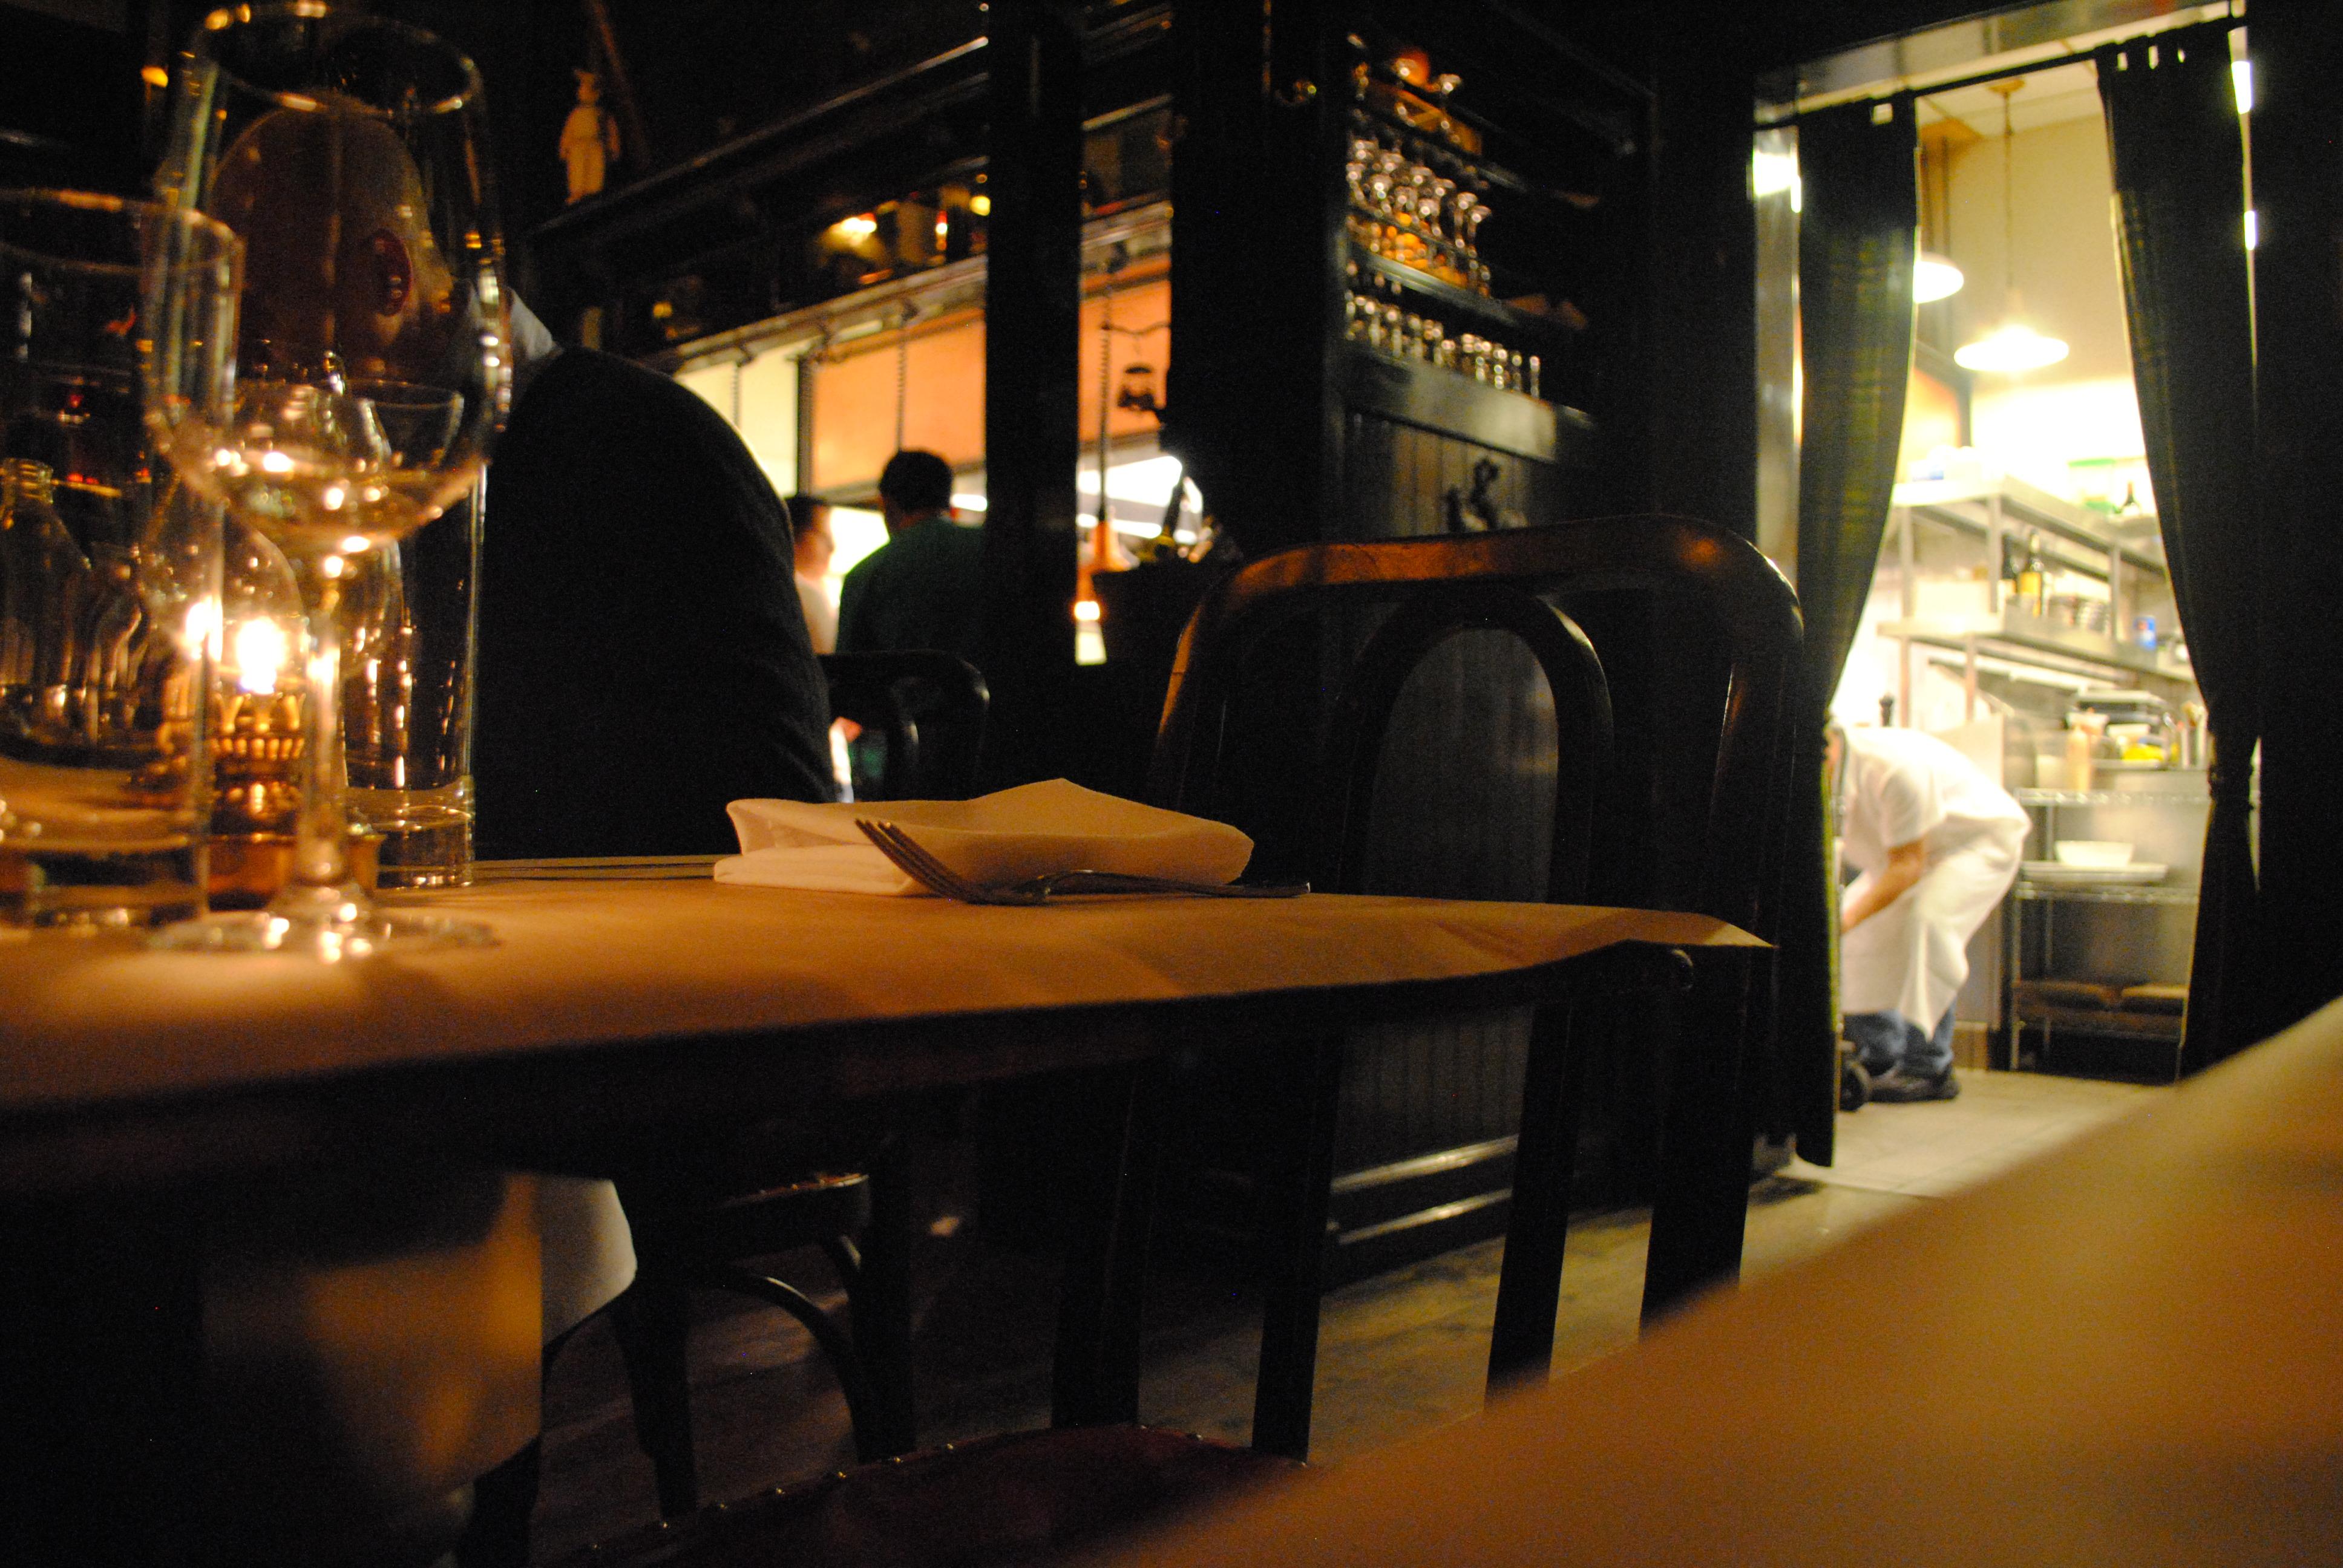 The Breslin Bar And Dining Room Tale 79 The Breslin The Ravenous Beast